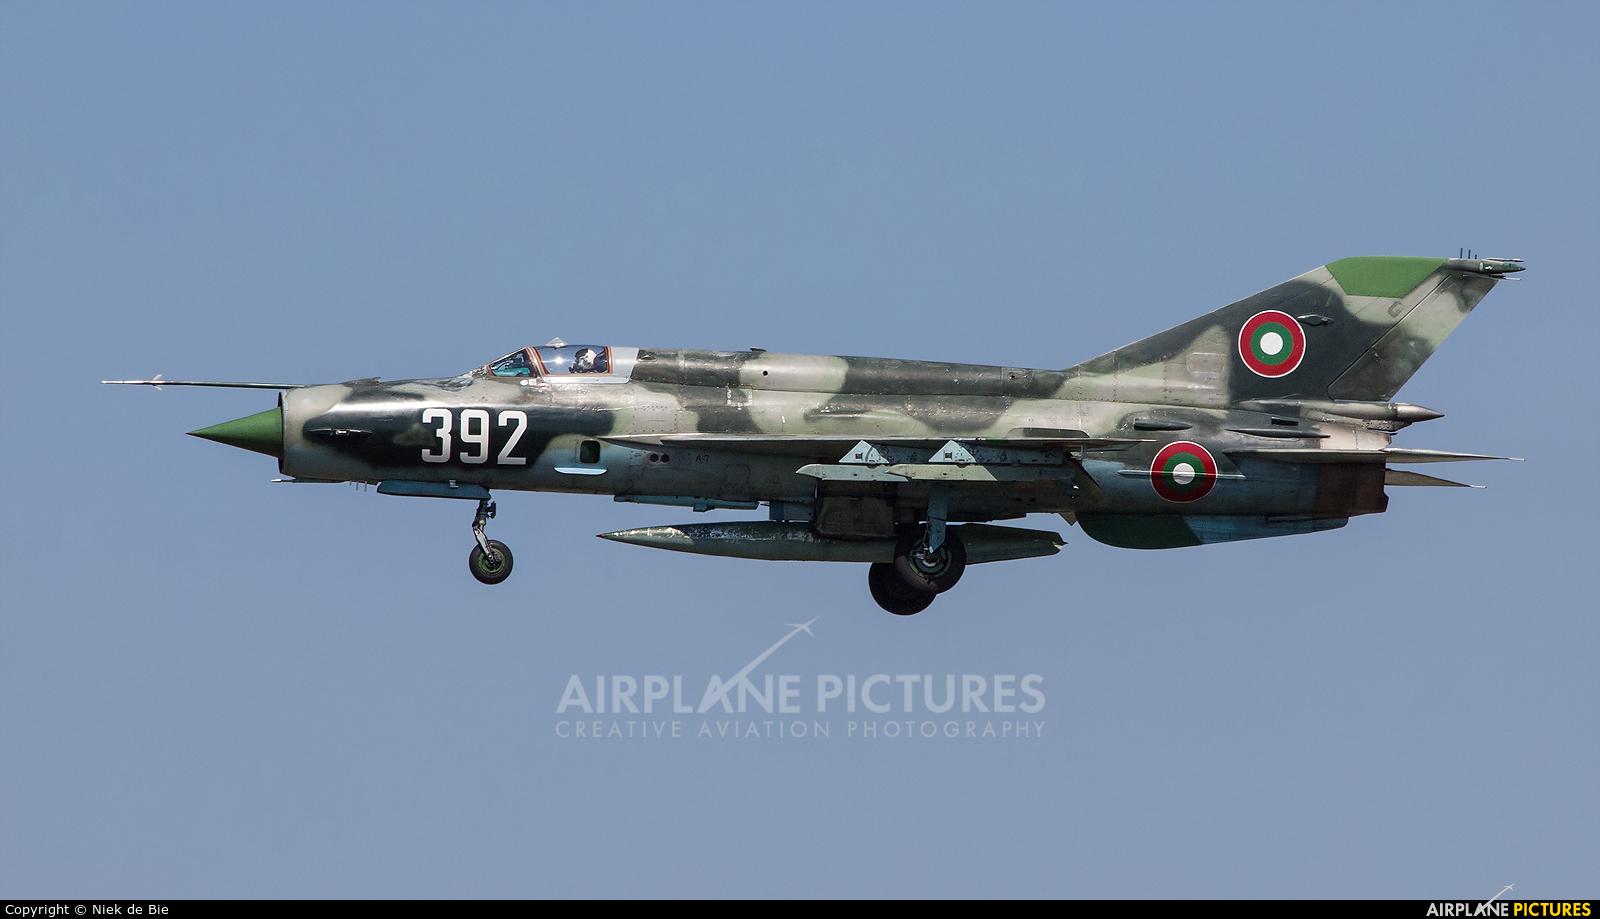 Bulgaria - Air Force 392 aircraft at Graf Ignatievo